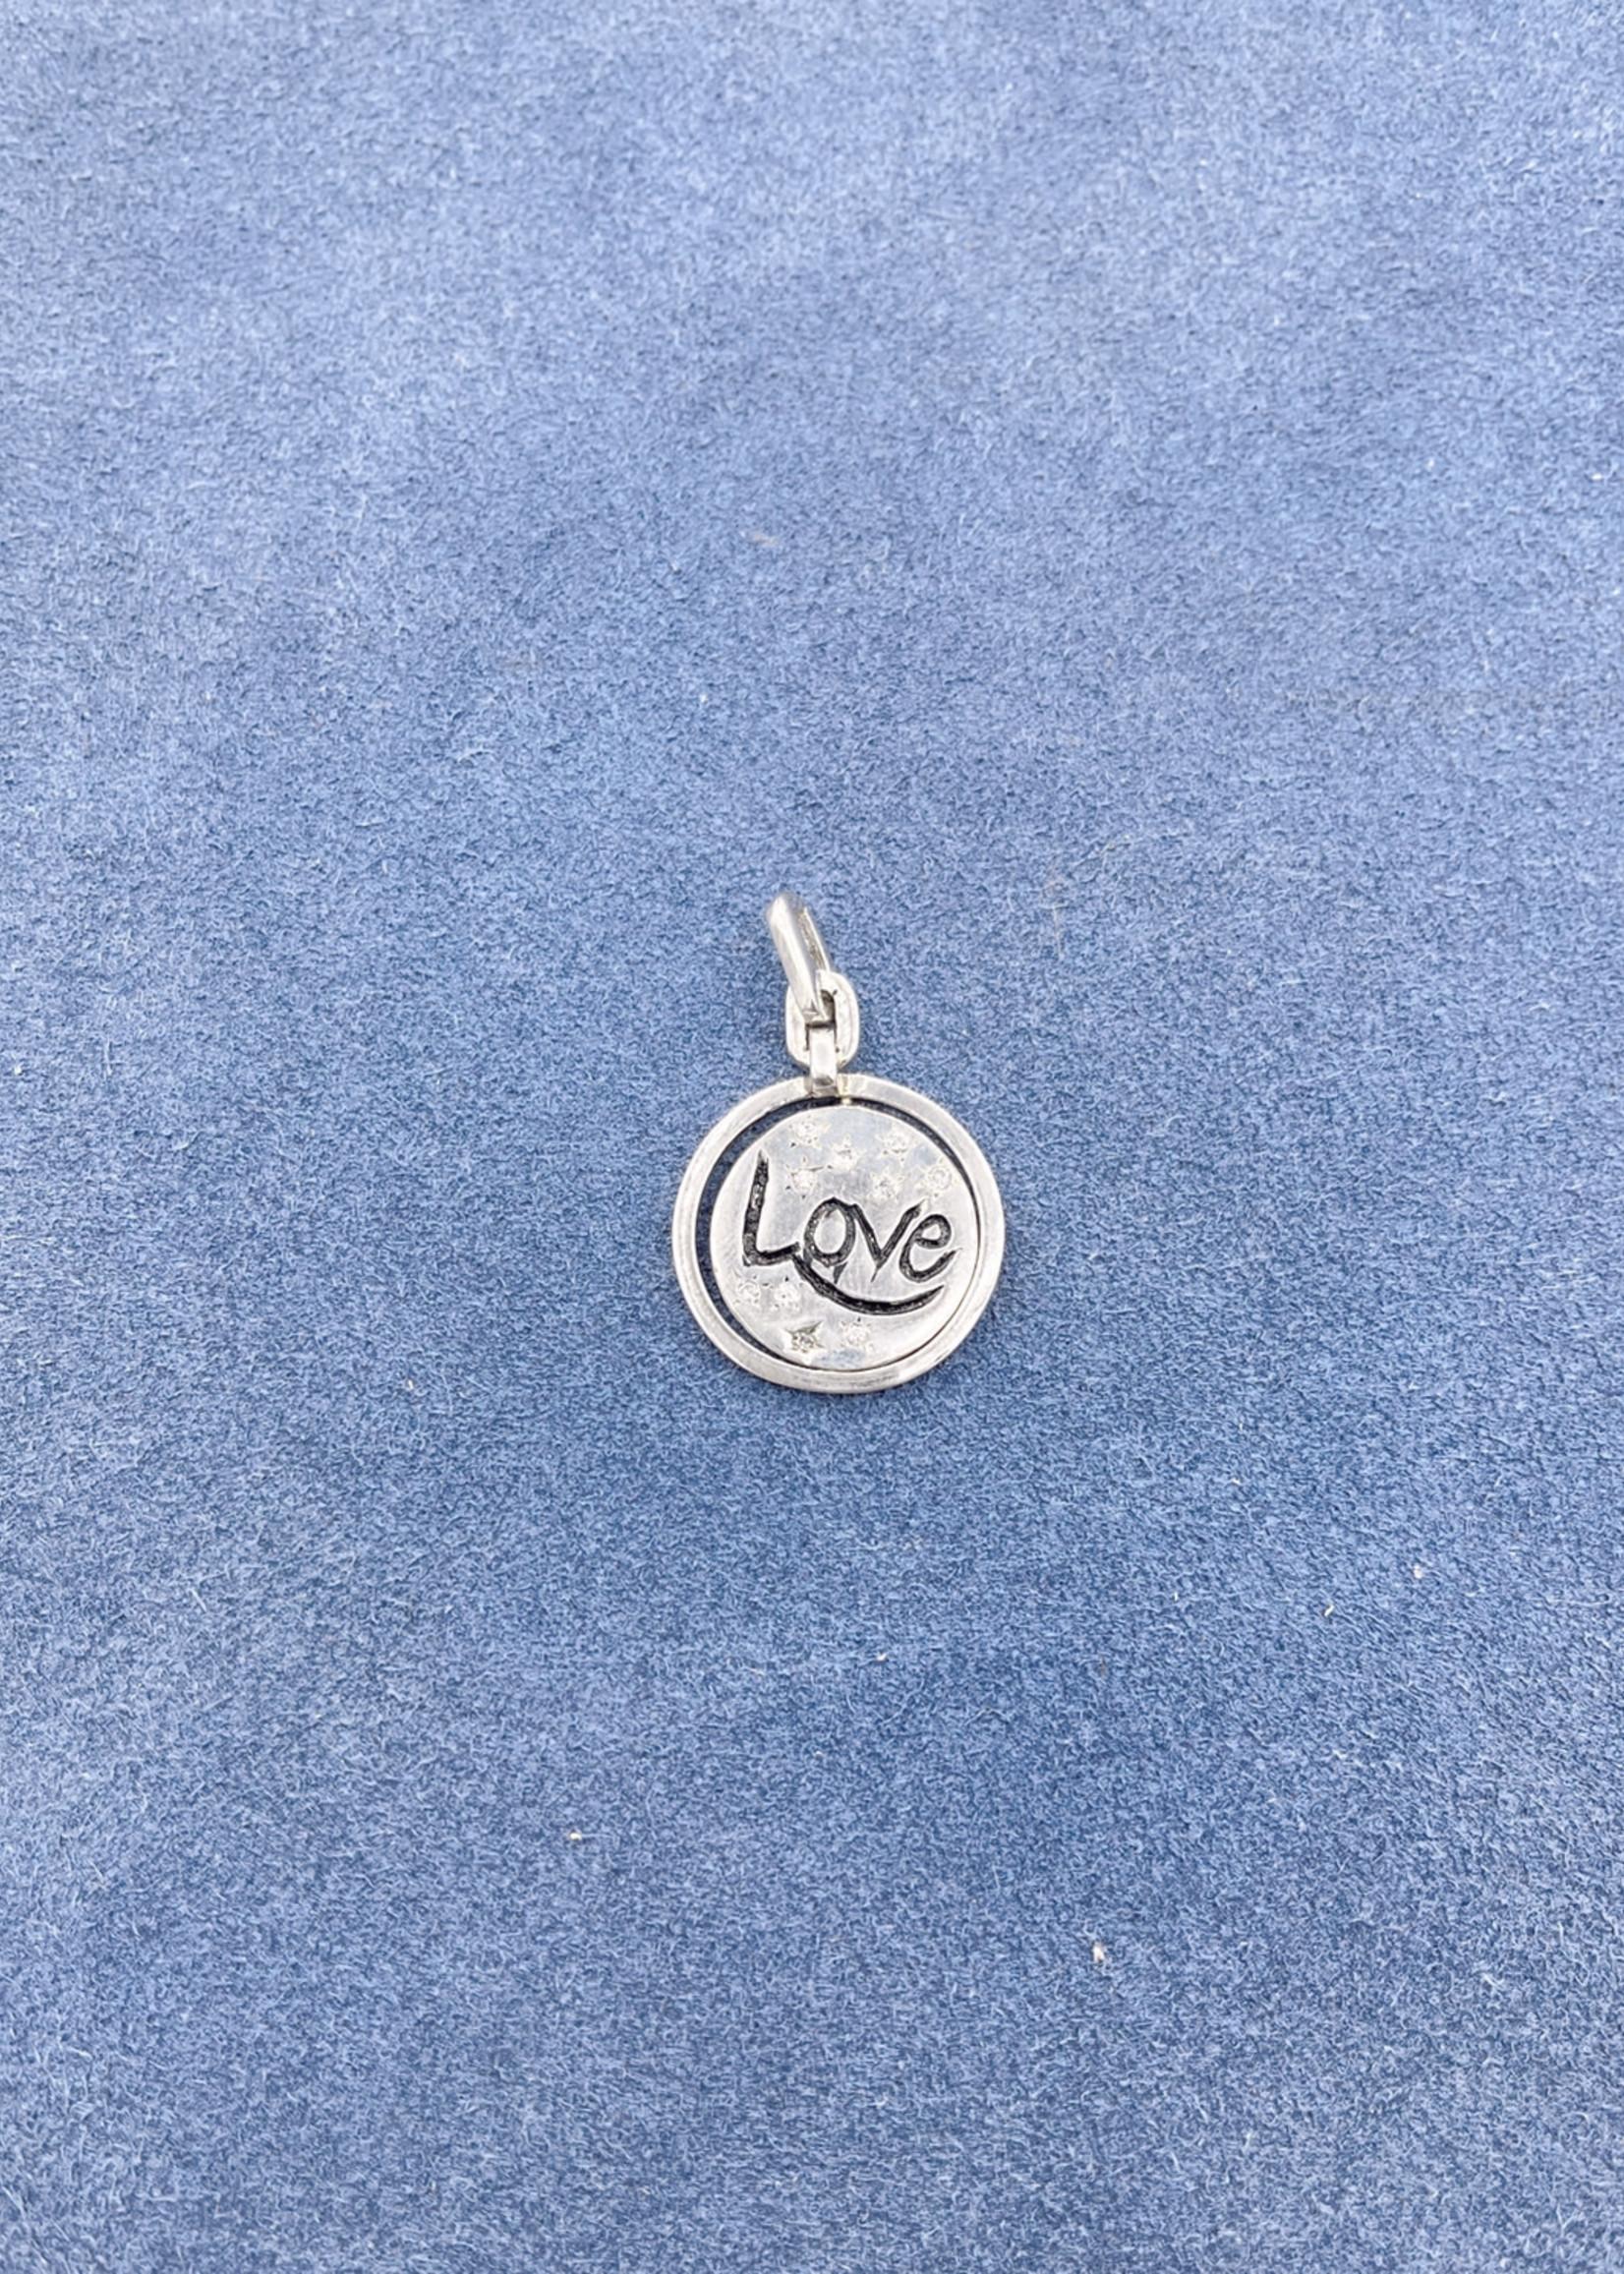 CJ Designs Love Pendant with Diamond